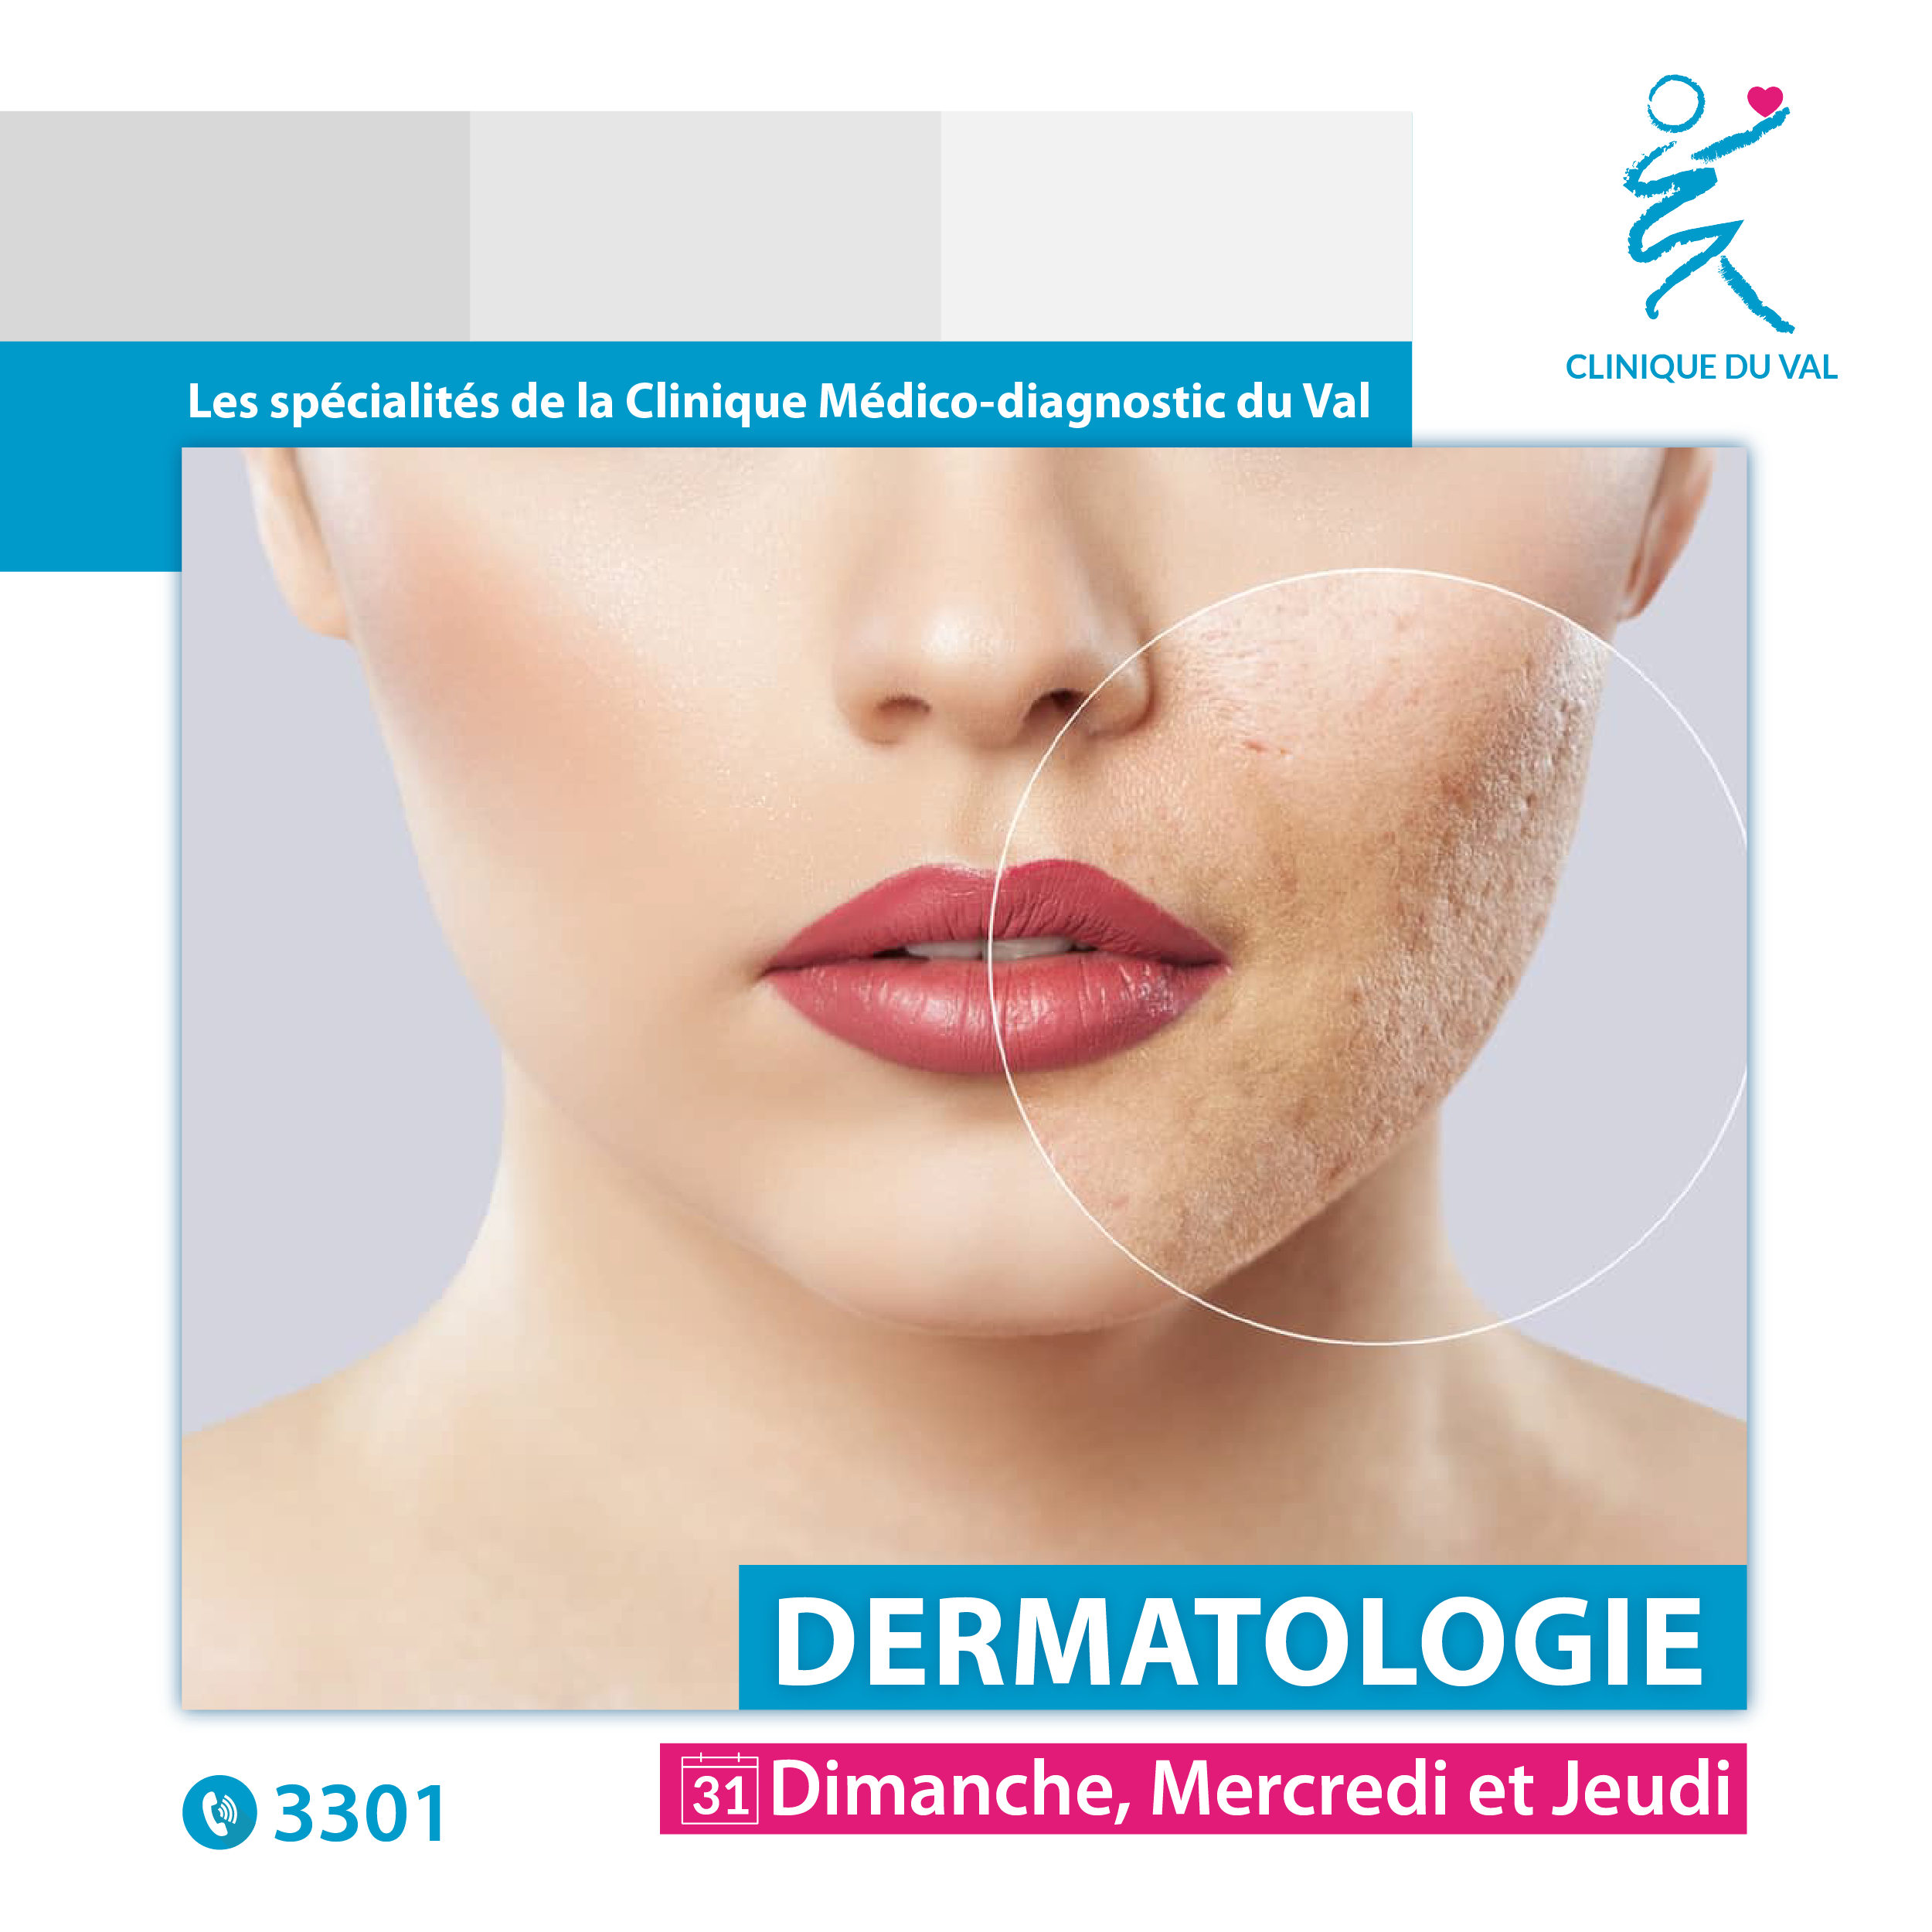 Consultation dermatologie